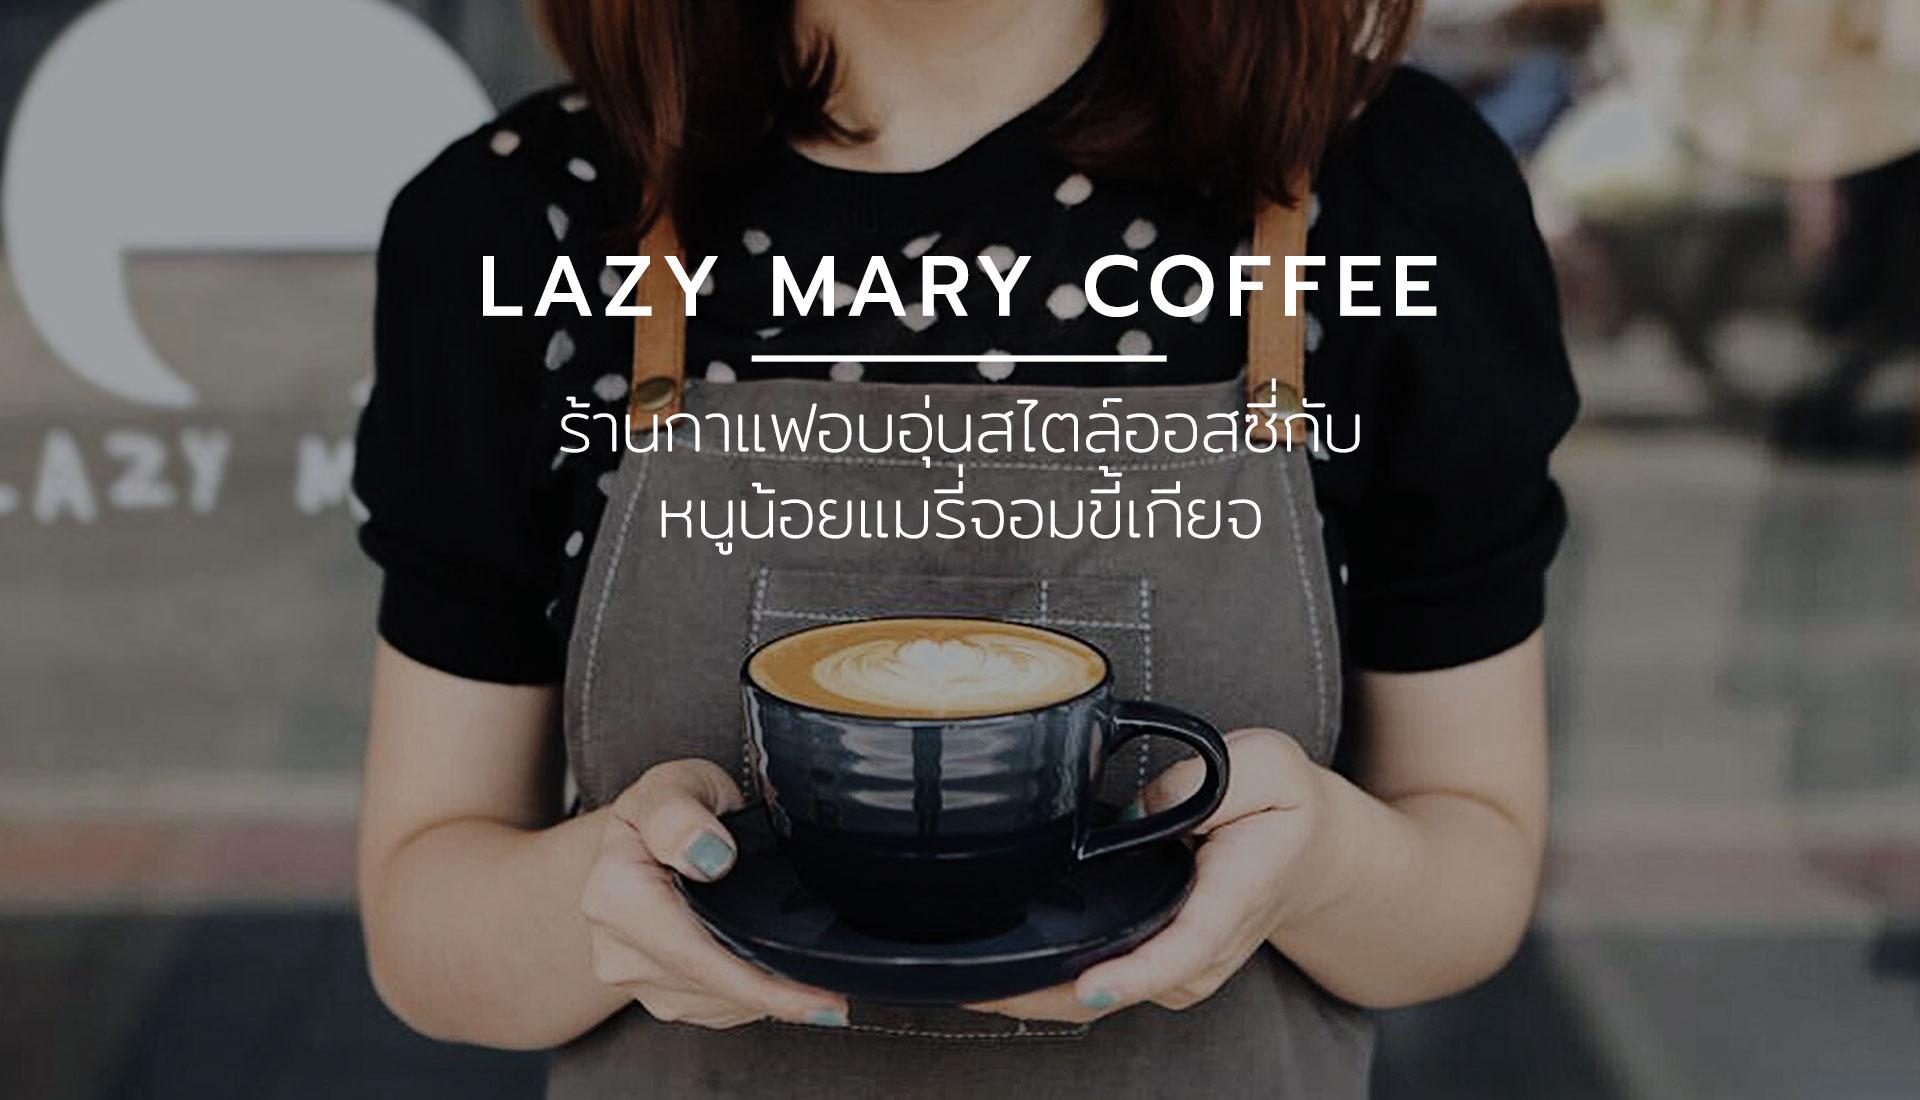 Lazy Mary Coffee